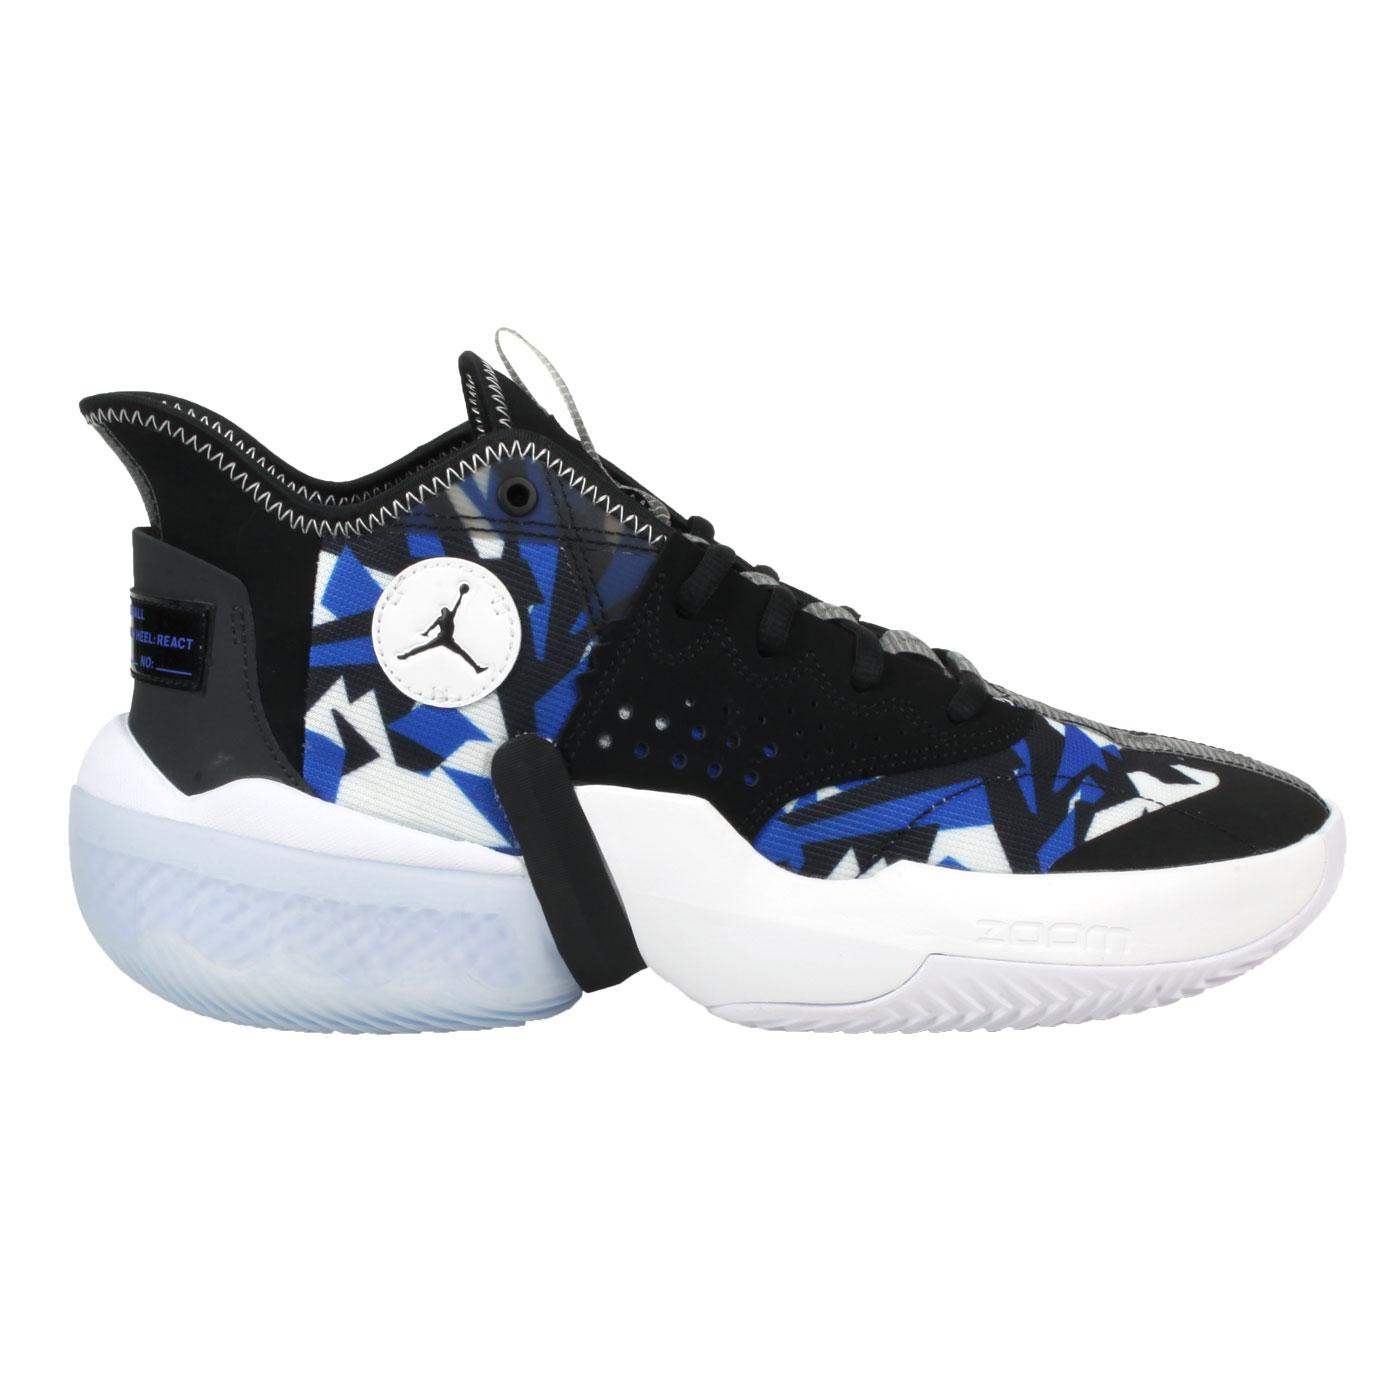 NIKE 限量-男款喬丹籃球鞋  @JORDAN REACT ELEVATION PF@CK6617004